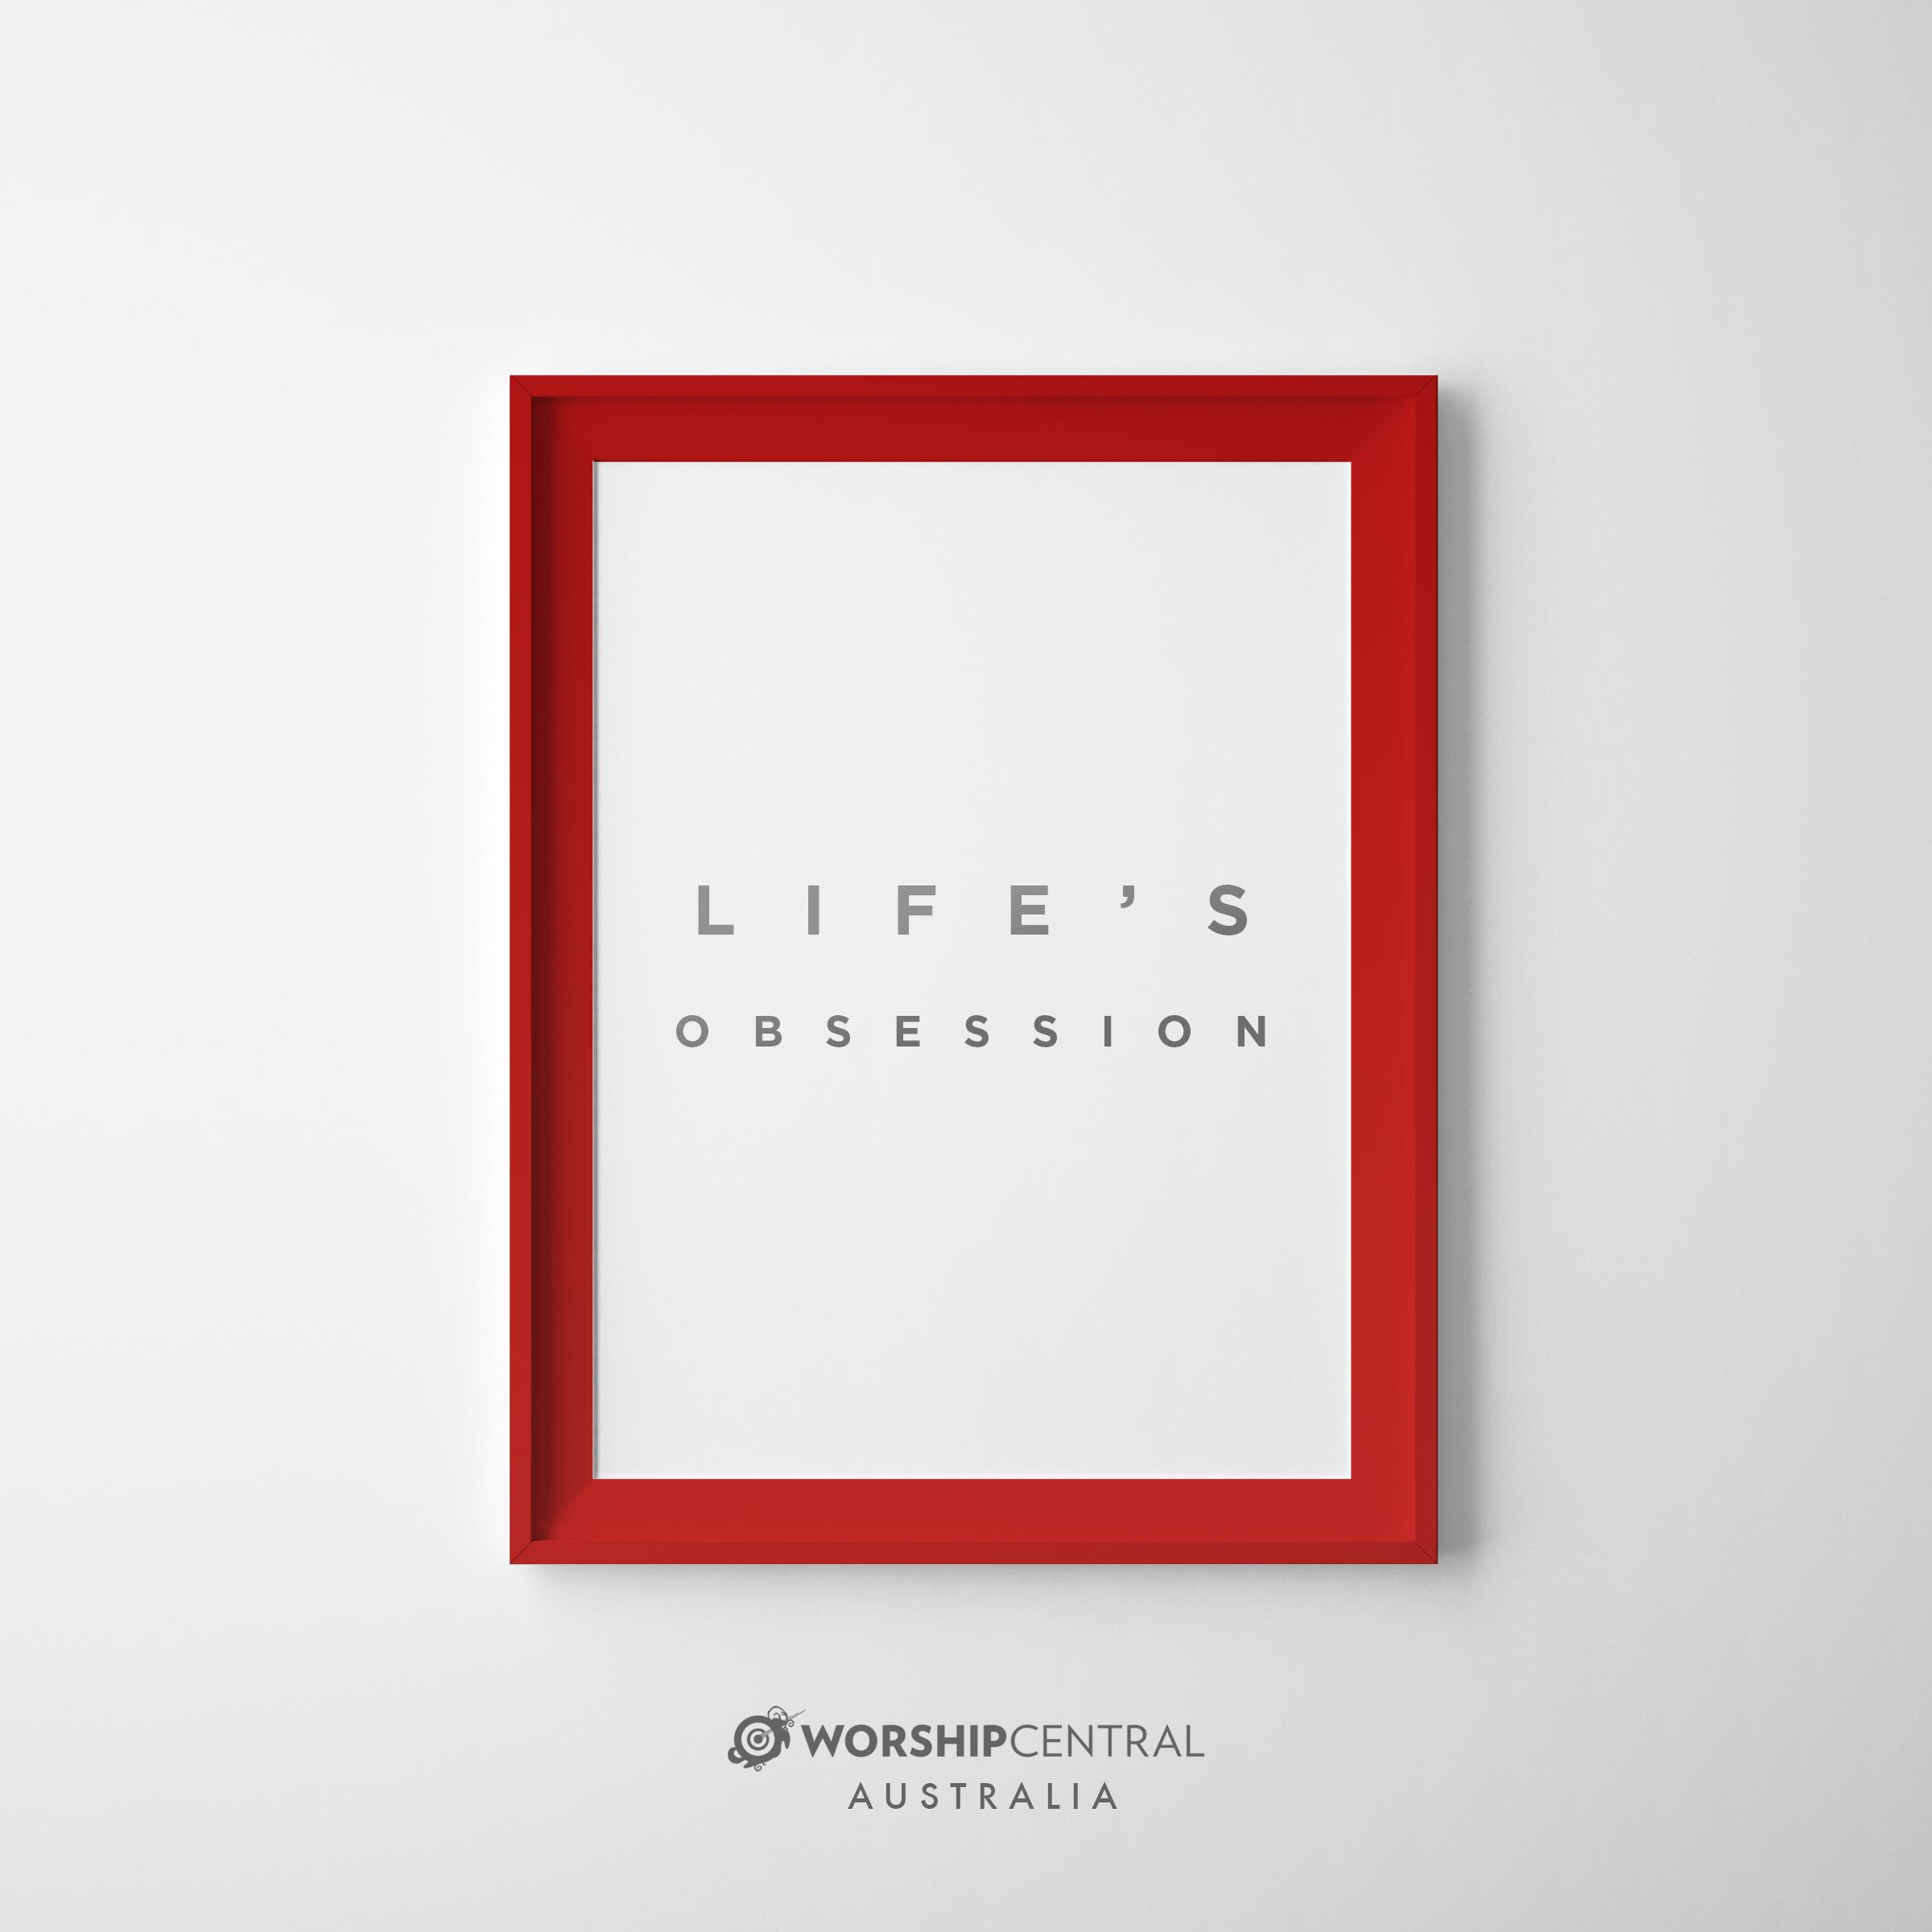 LifesObsession_Artwork2400x2400.jpg